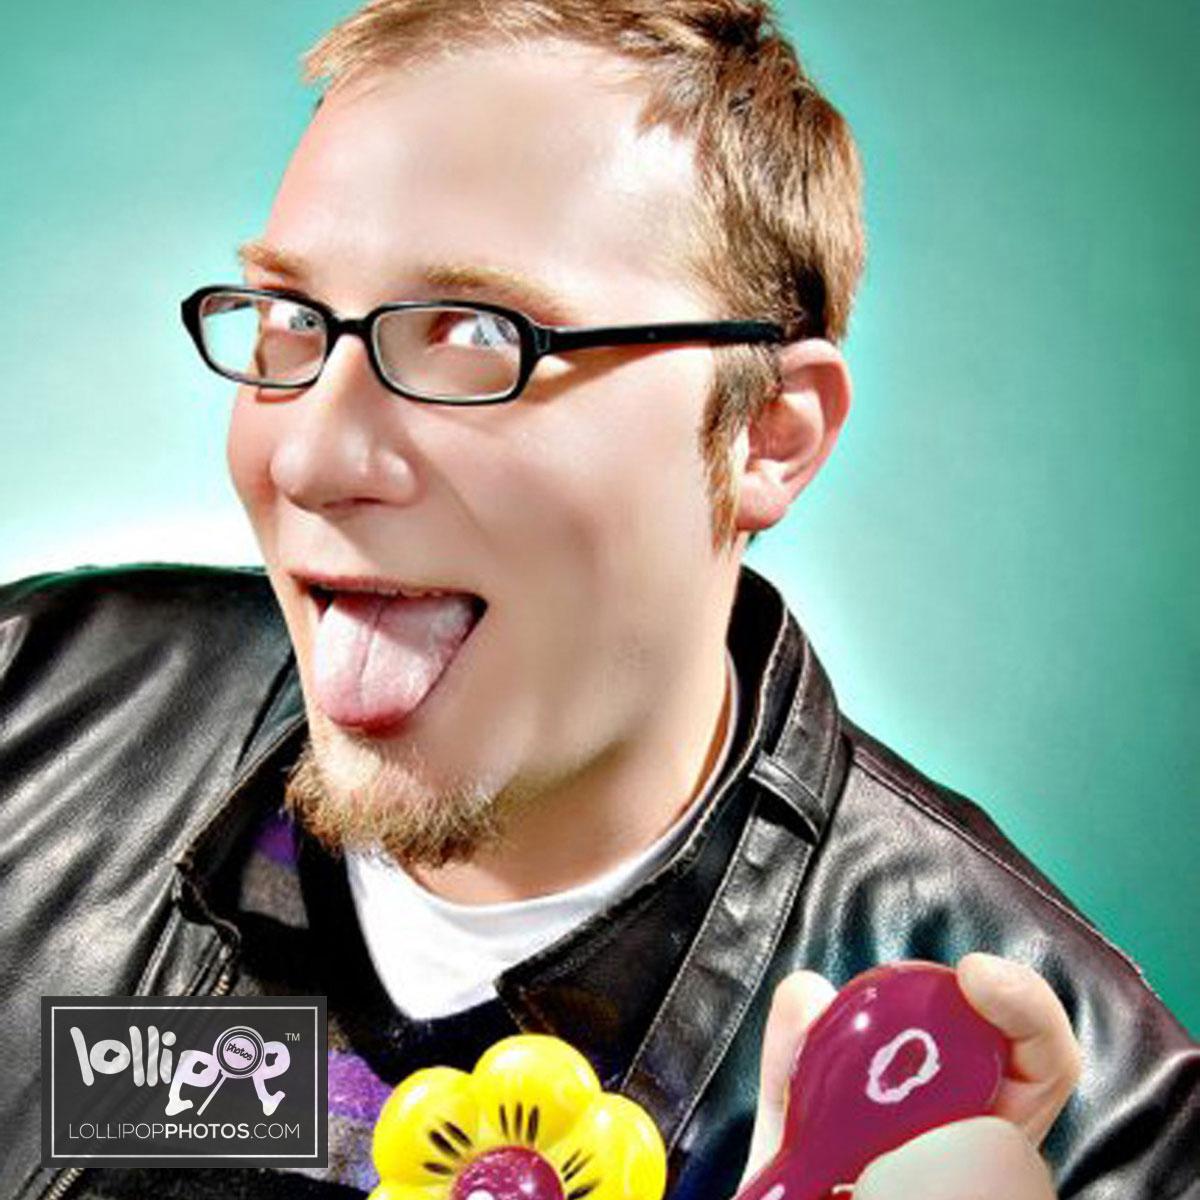 msdig-nora-canfield-lollipop-photos-181.jpg